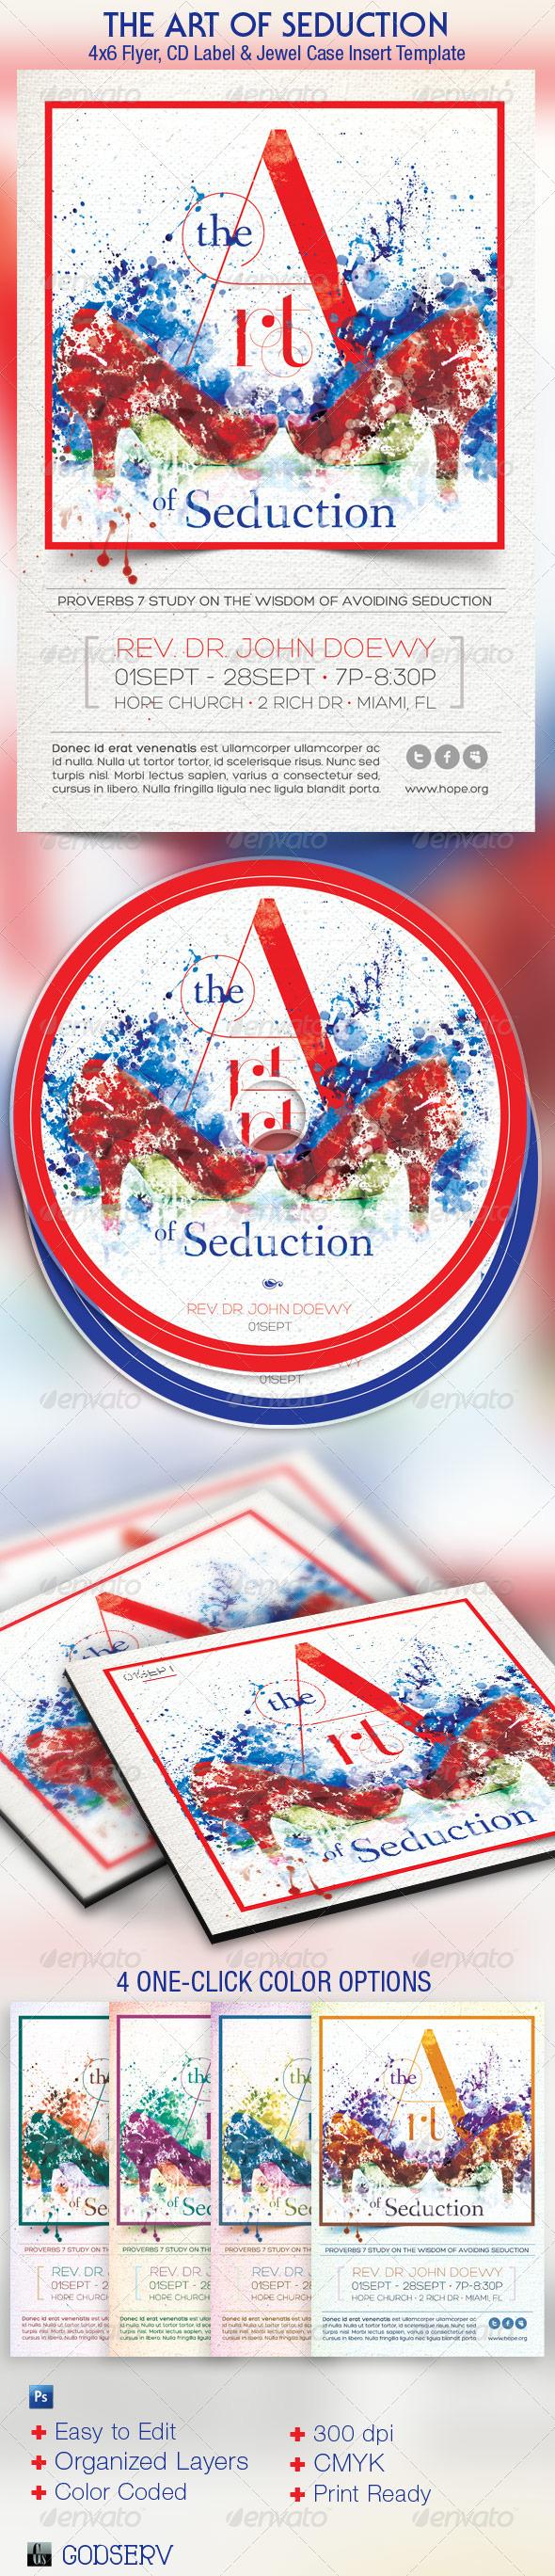 Seduction Church Flyer CD Template - Church Flyers